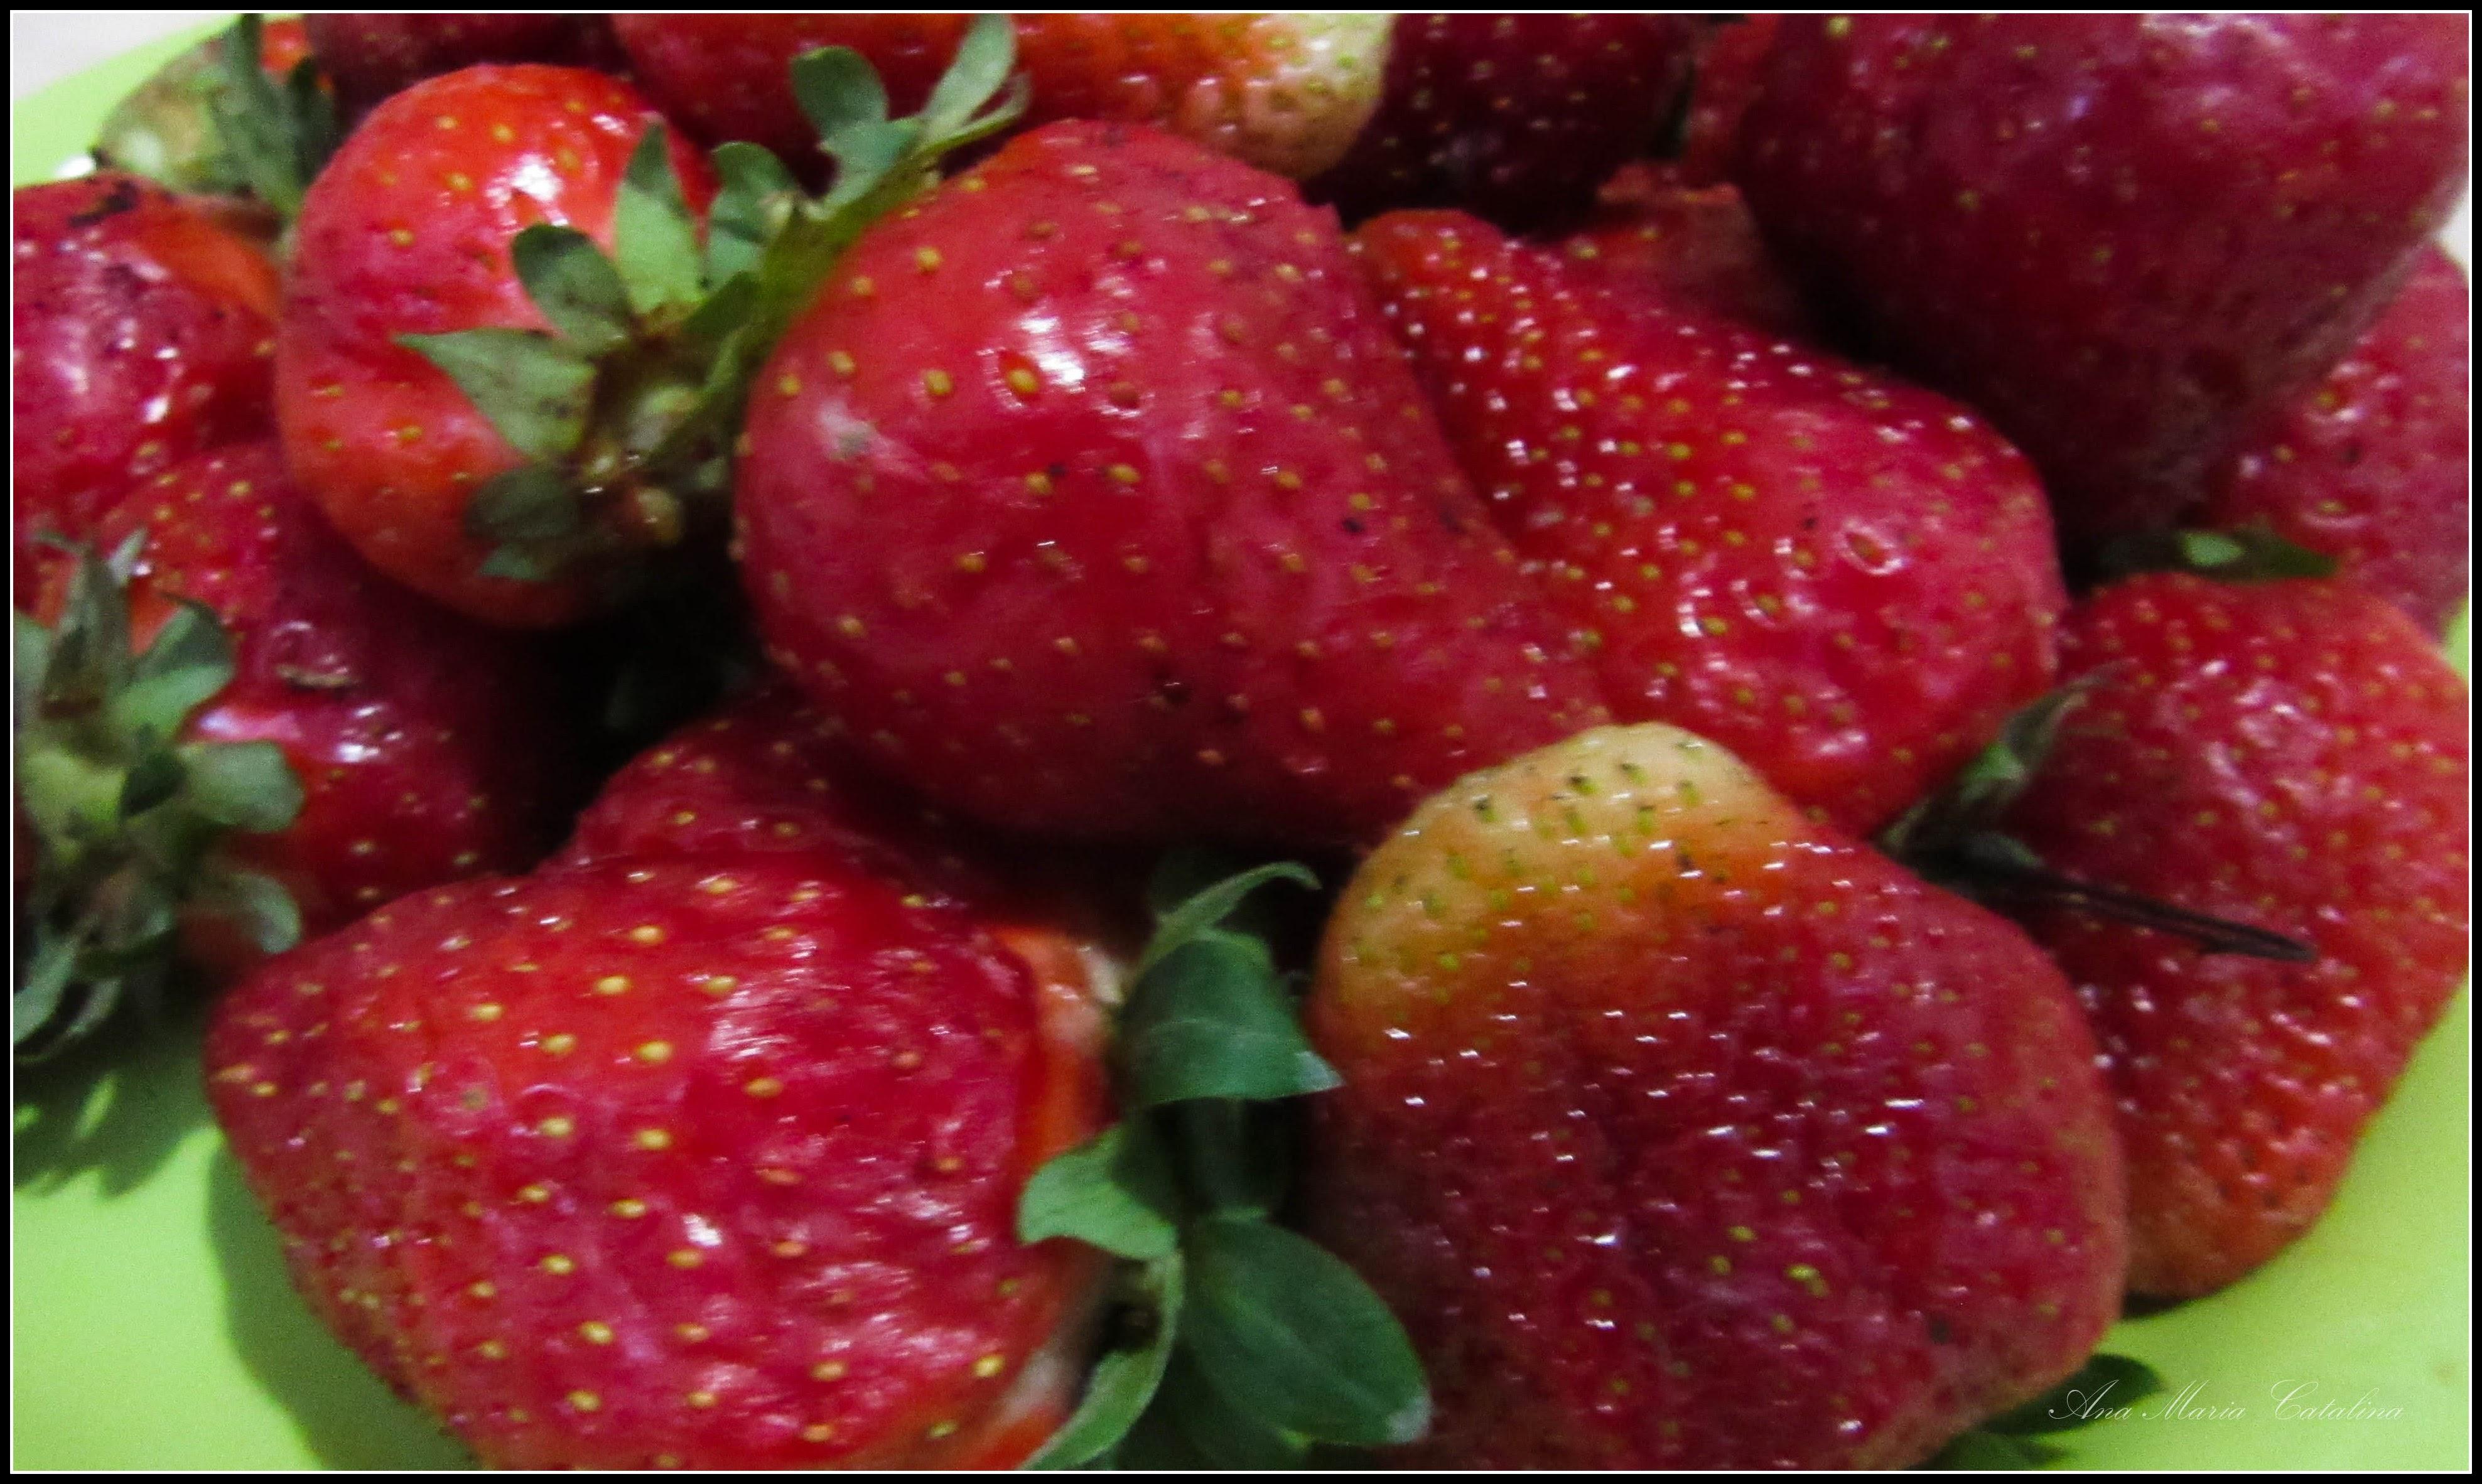 Photo: Căpșuni - (Fragaria ×ananassa) - din Piata Agroalimentara de pe Str. Tineretului - 2017.05.22 http://ana-maria-catalina.blogspot.ro/2017/05/plante-diverse-din-comert.html